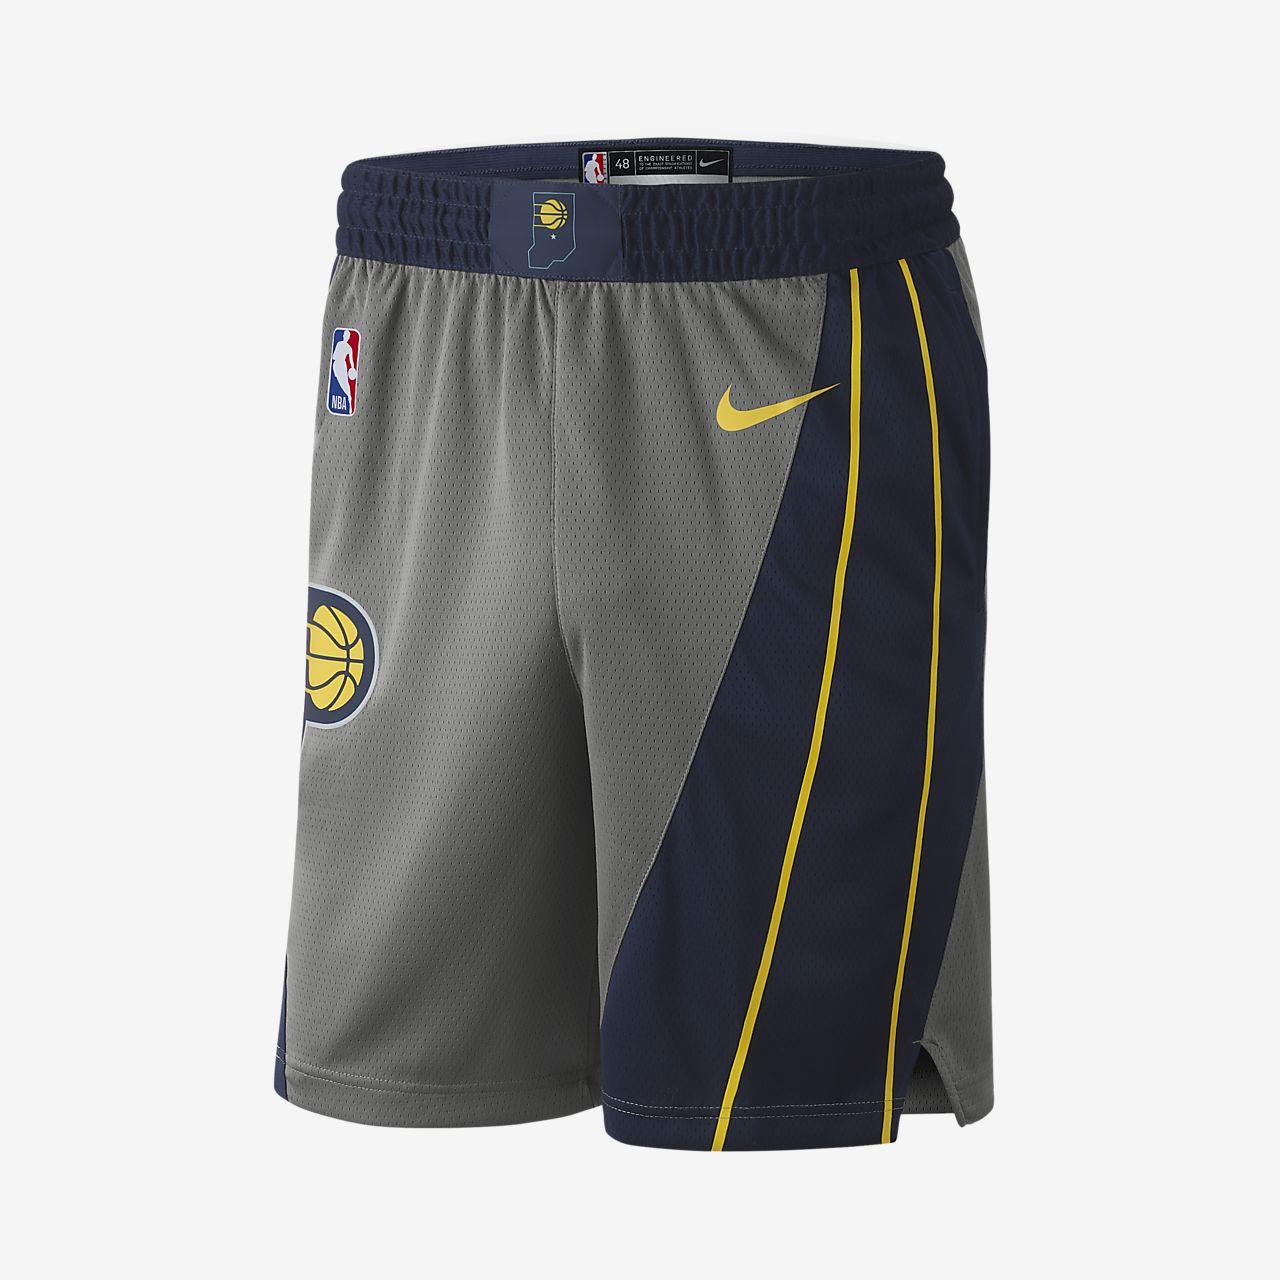 3c61316e7020 Indiana Pacers City Edition Swingman Men s Nike NBA Shorts. Nike.com DK